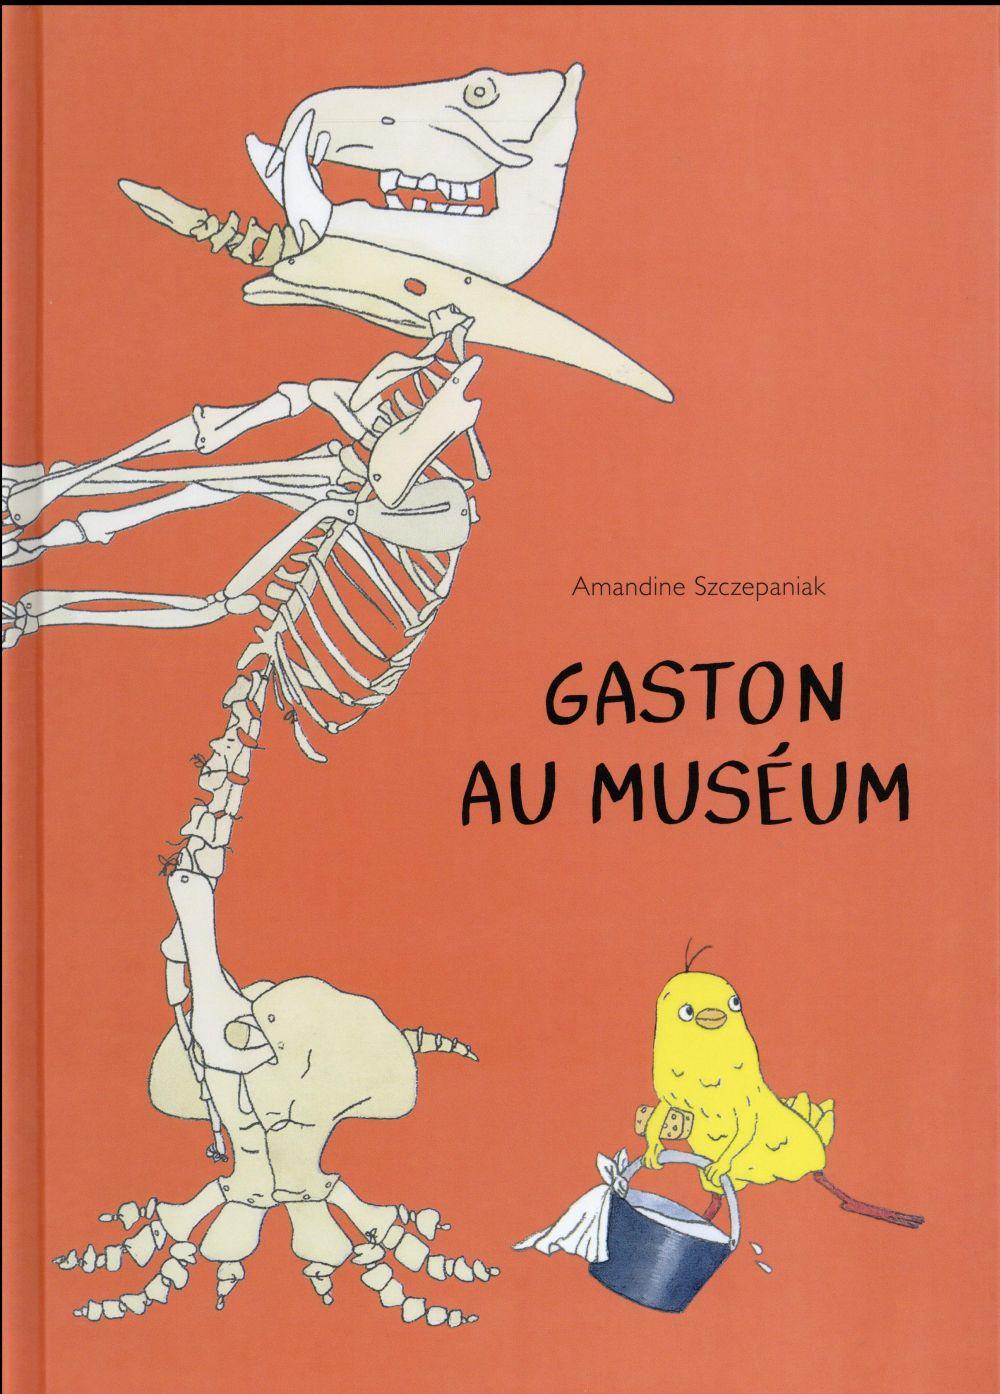 GASTON AU MUSEUM